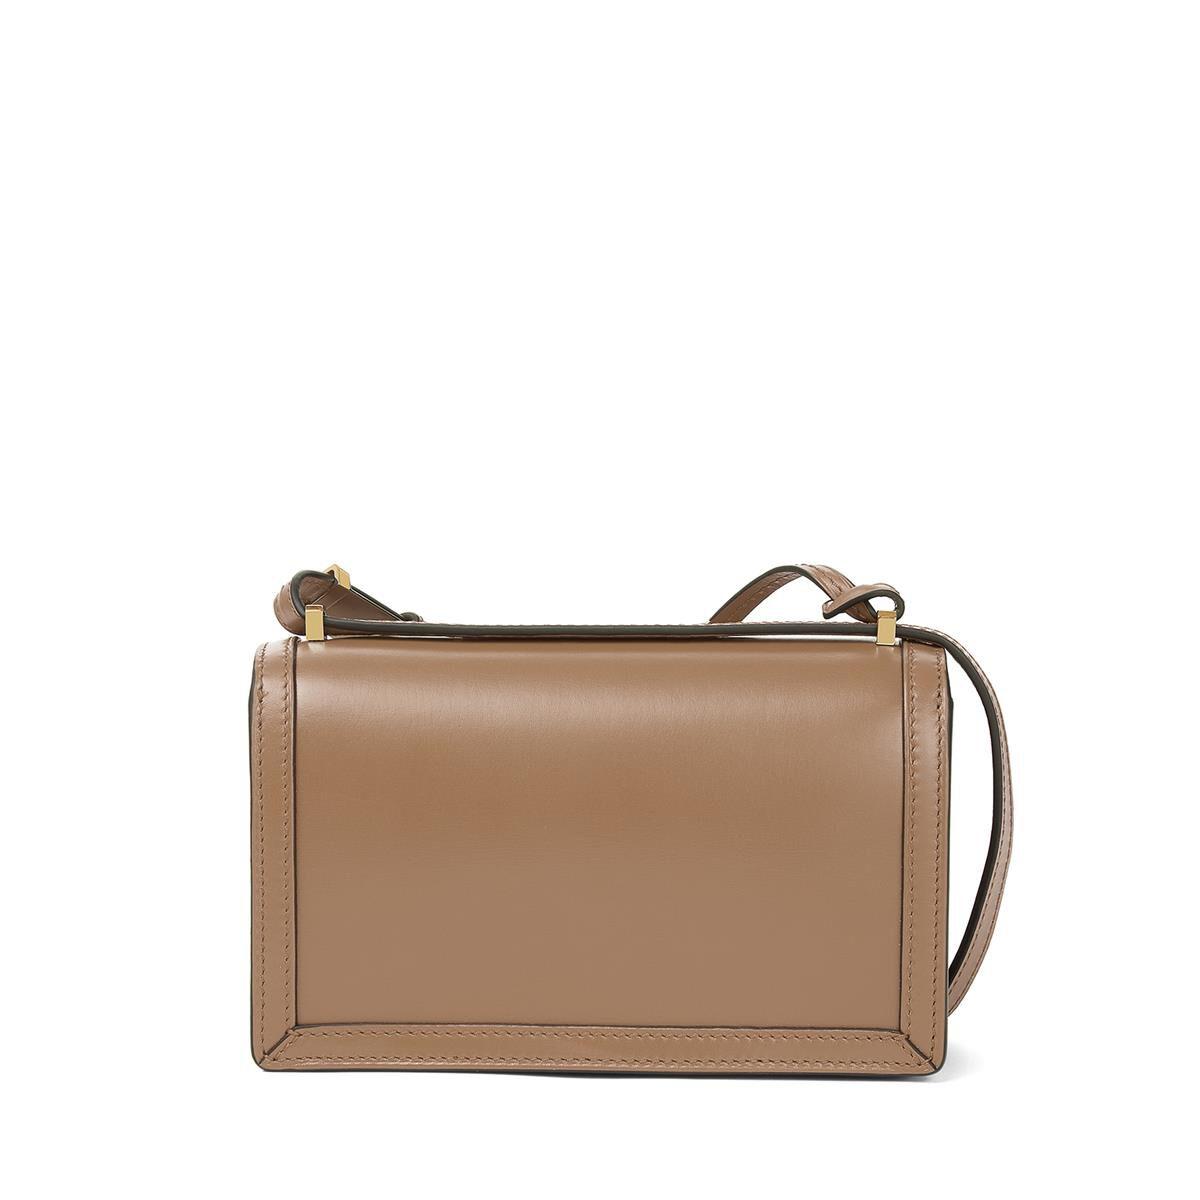 LOEWE Barcelona Small Bag Mink Color all